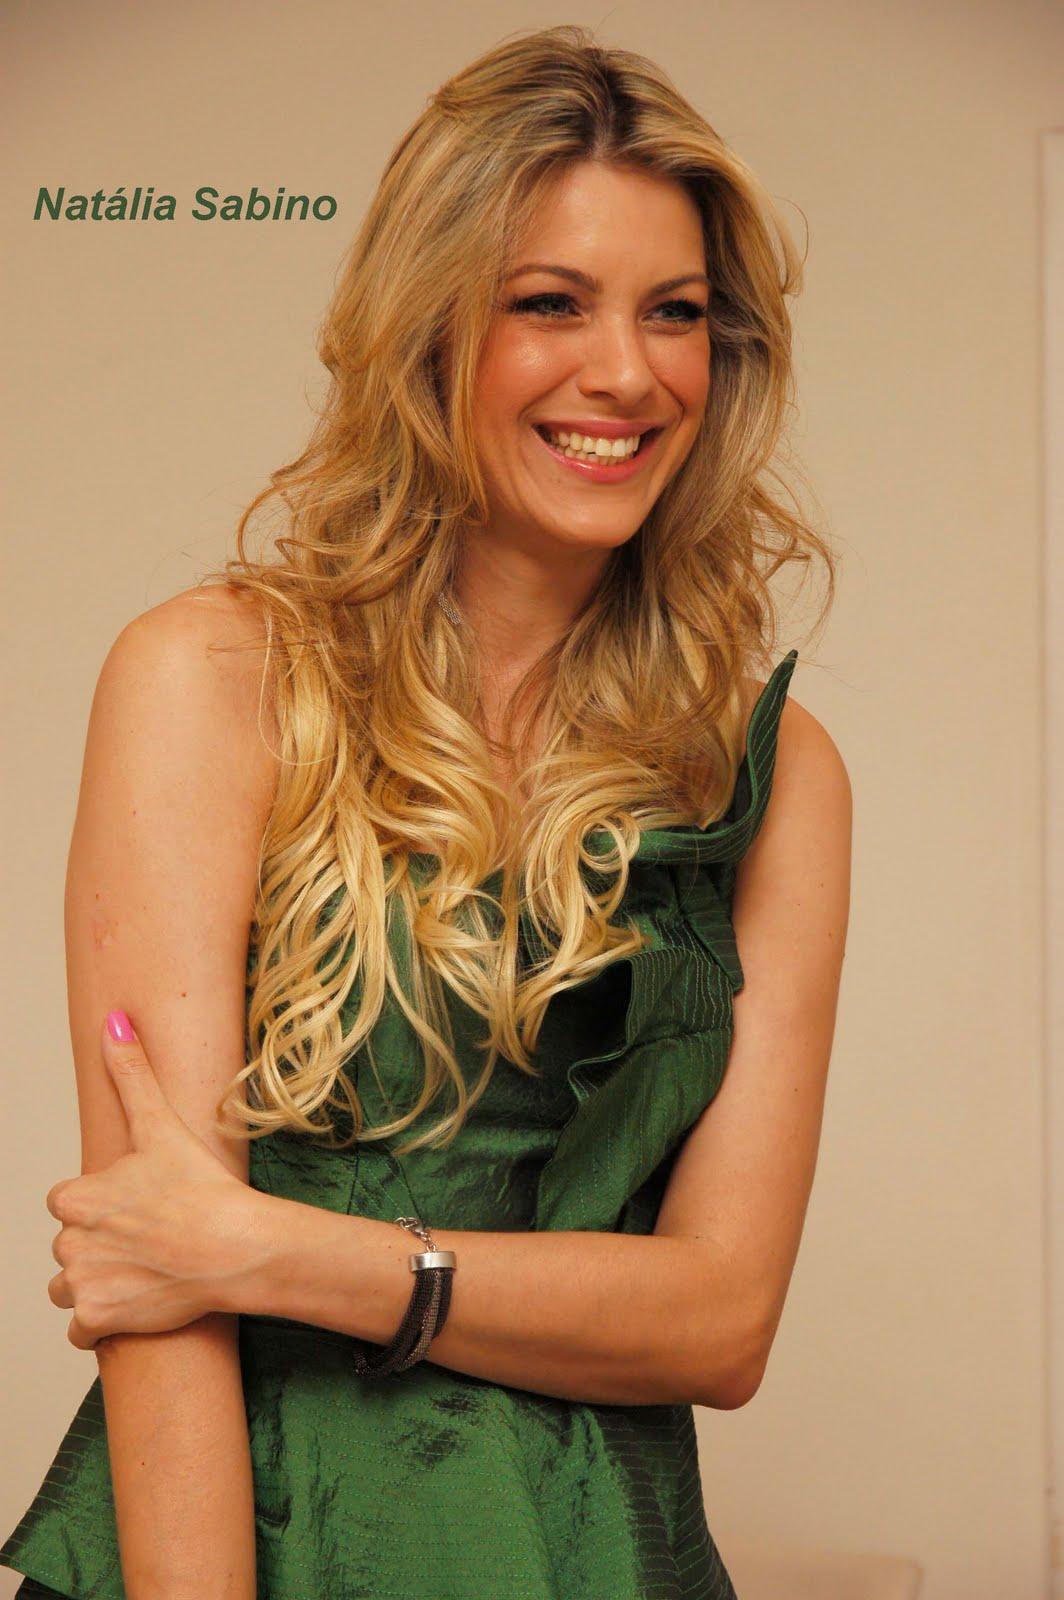 Natália Sabino